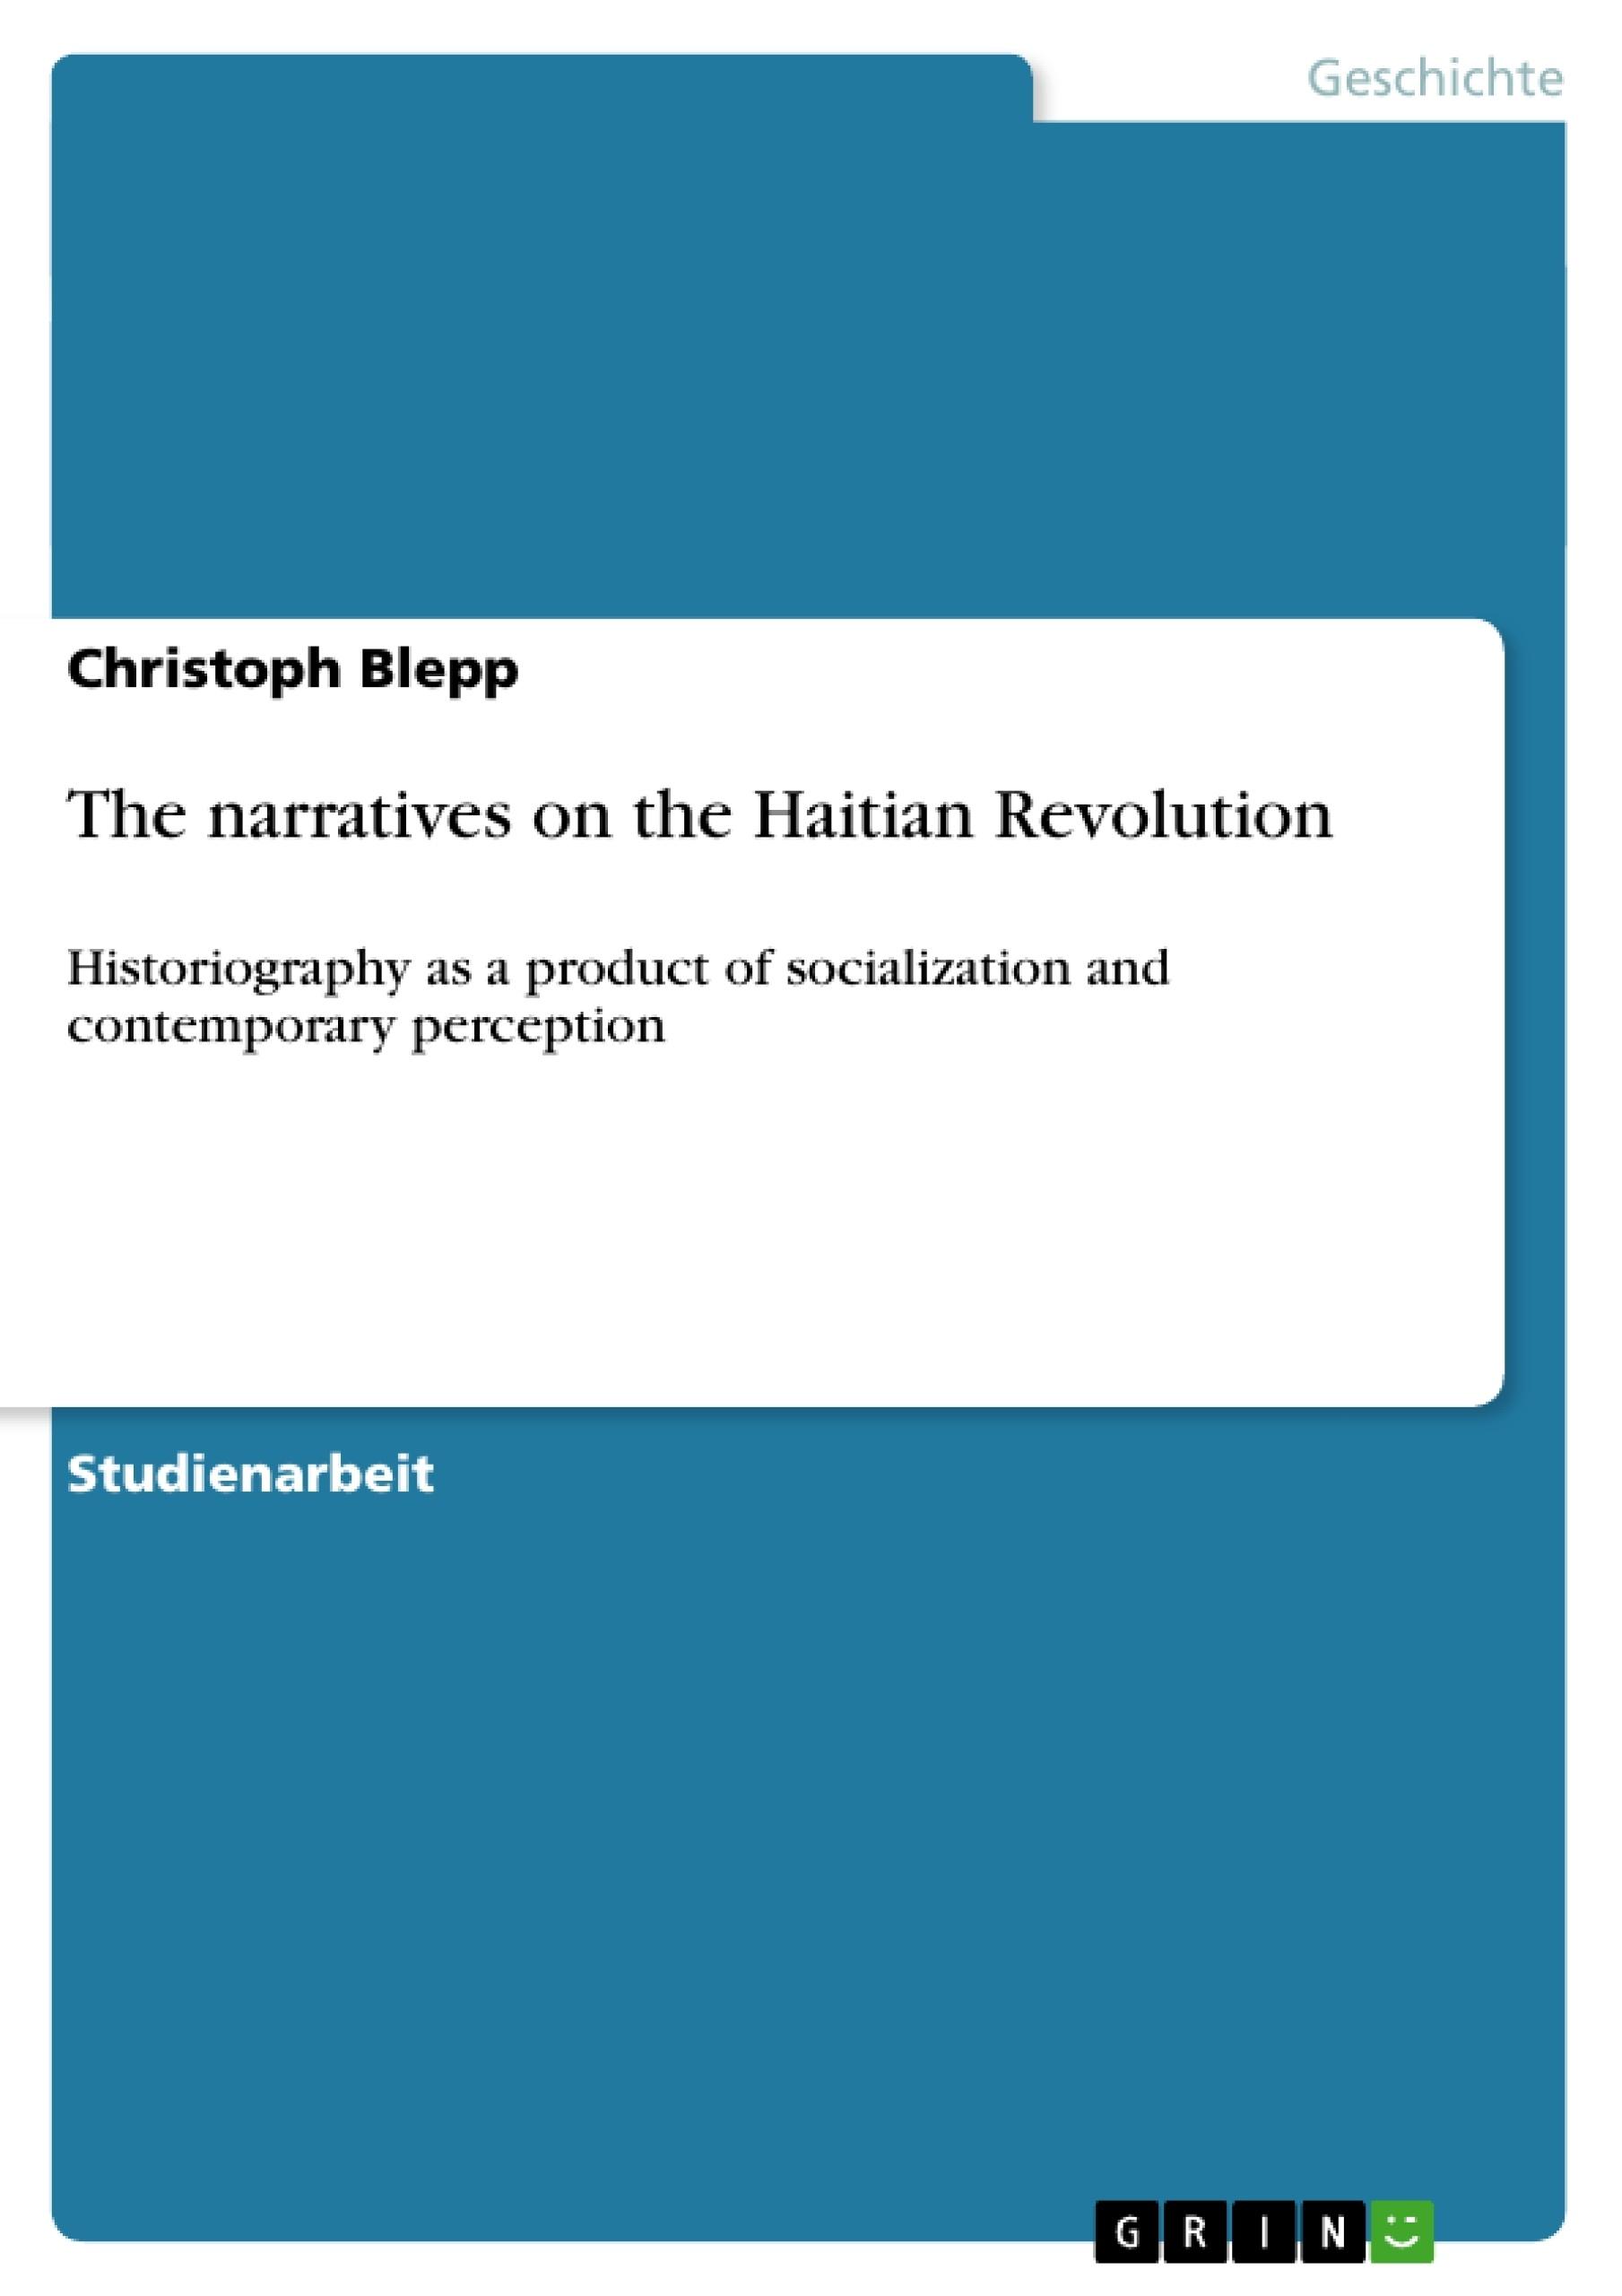 Titel: The narratives on the Haitian Revolution